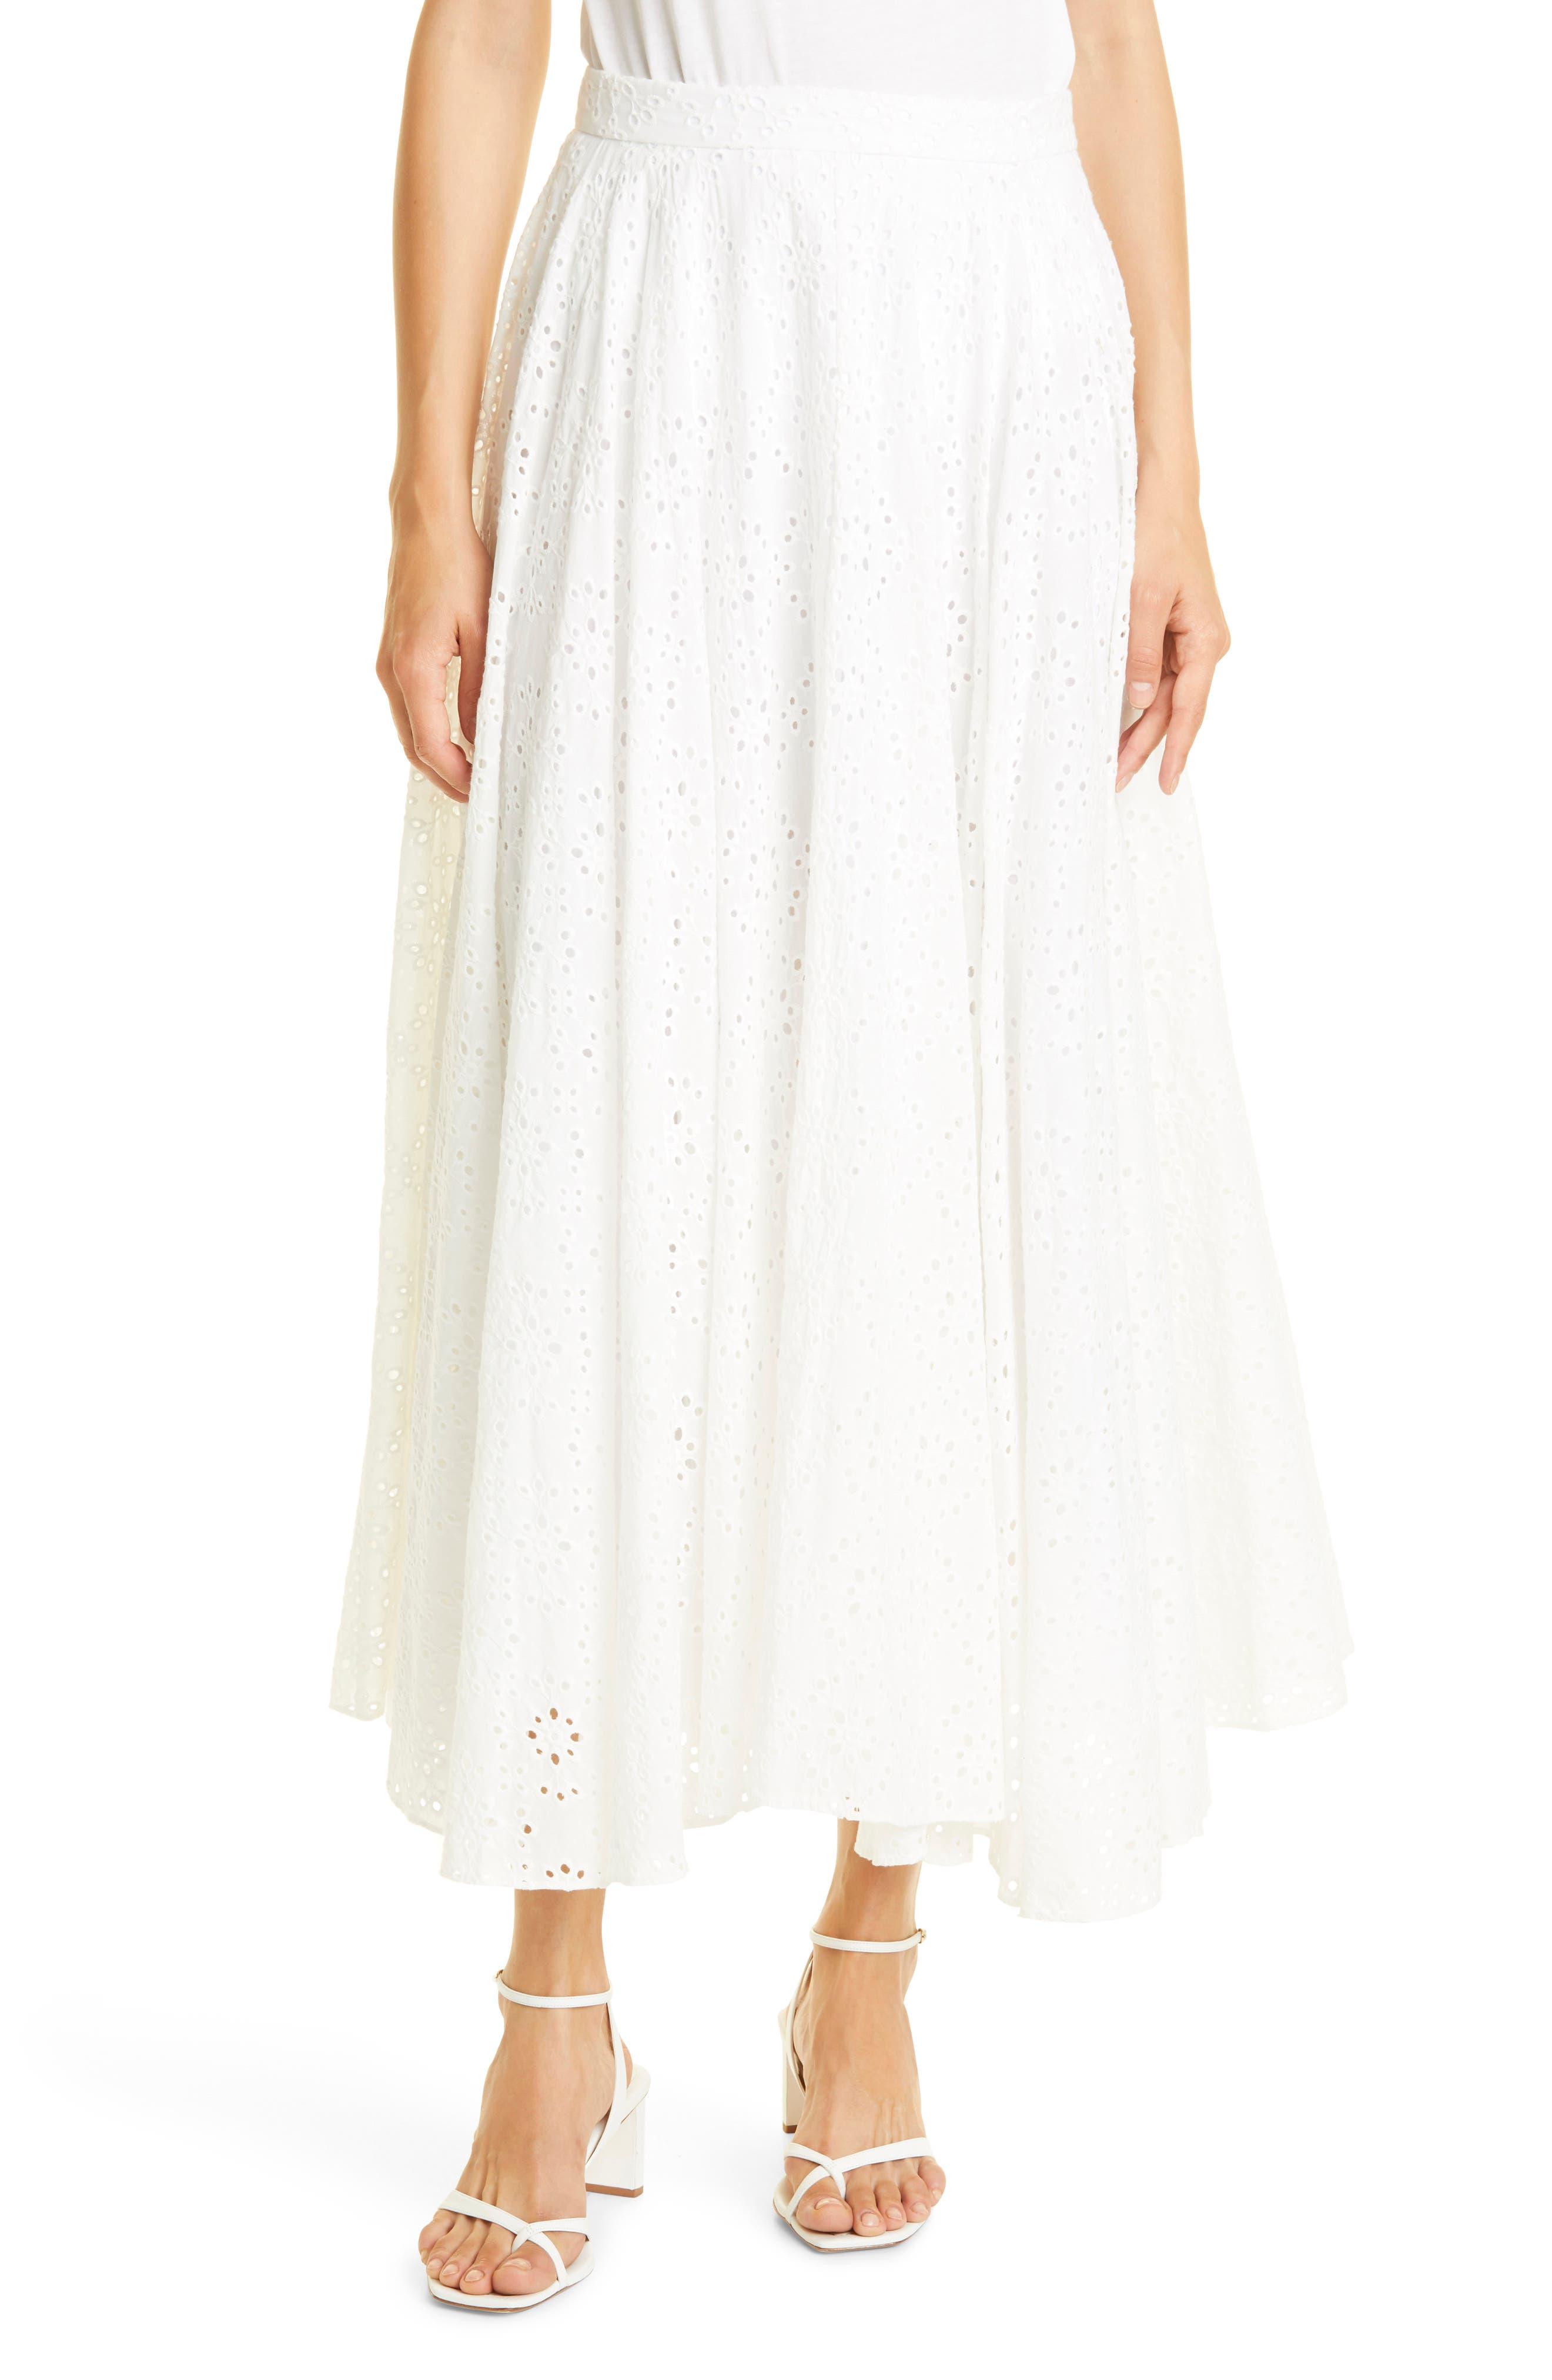 Aquinnah Cotton Eyelet Skirt